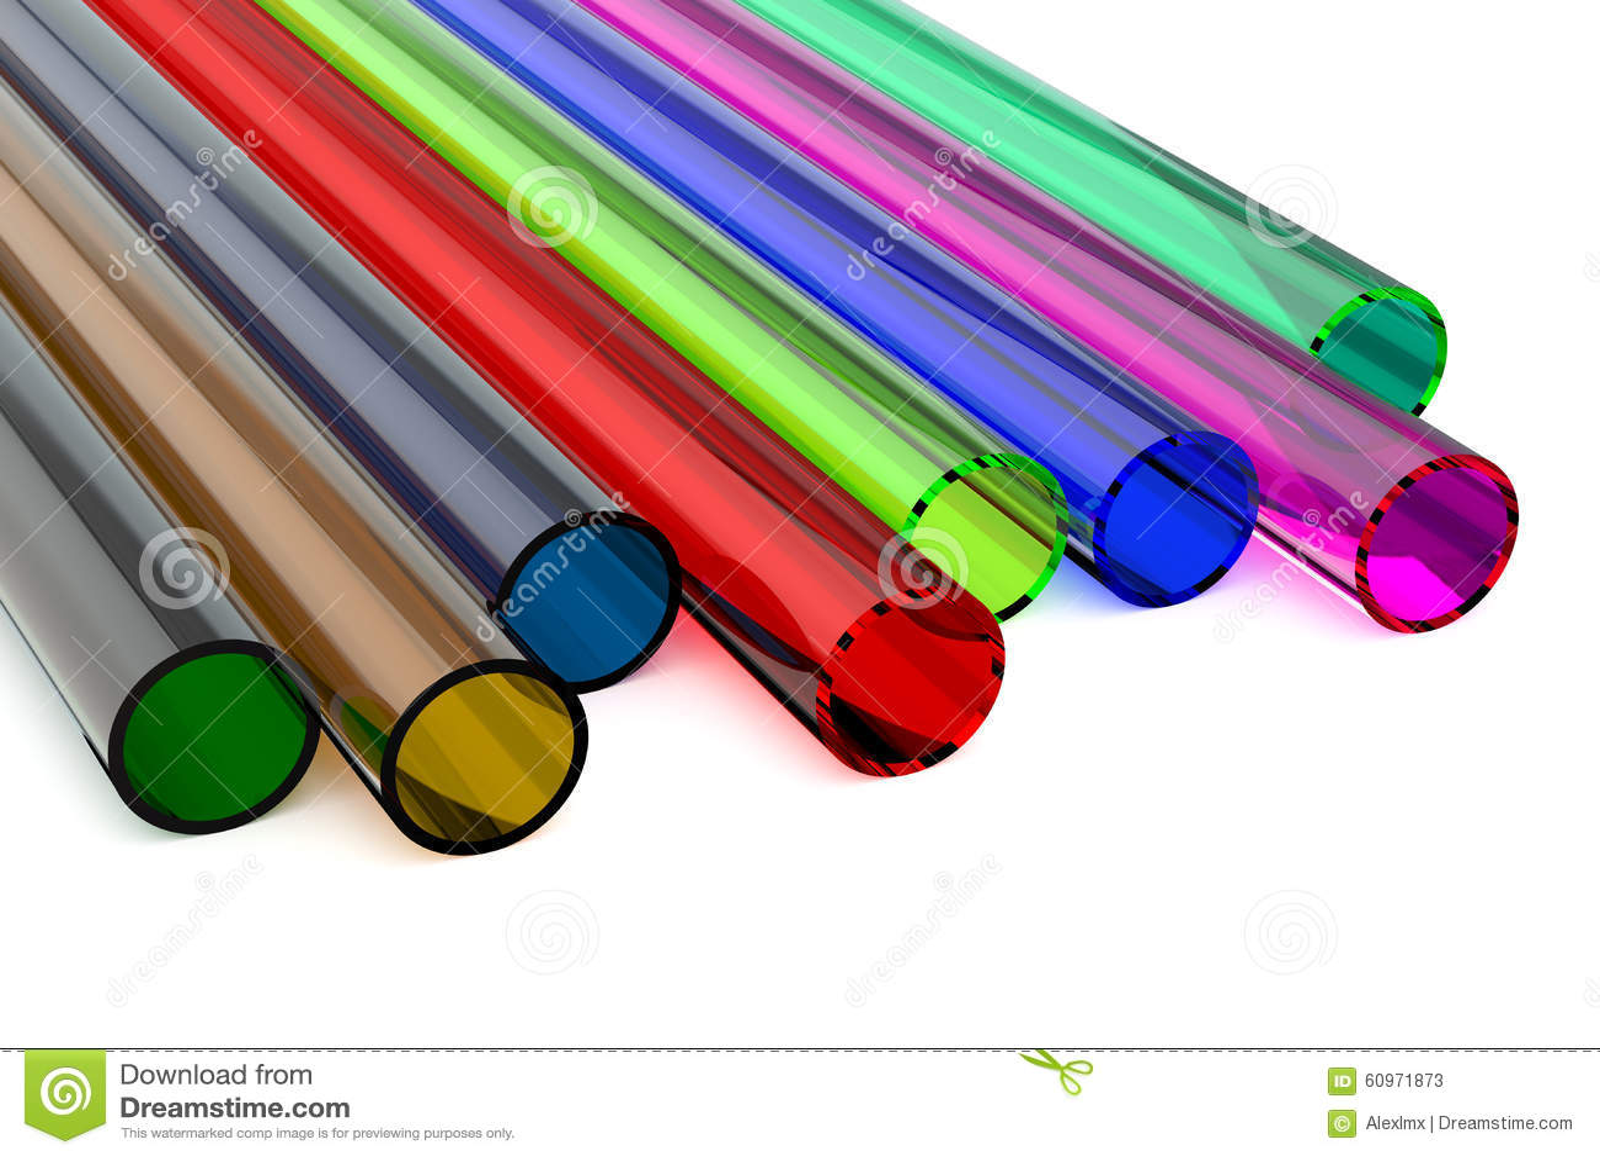 Tubi in plastica colorati raccordi tubi innocenti for Tipi di tubi idraulici in plastica